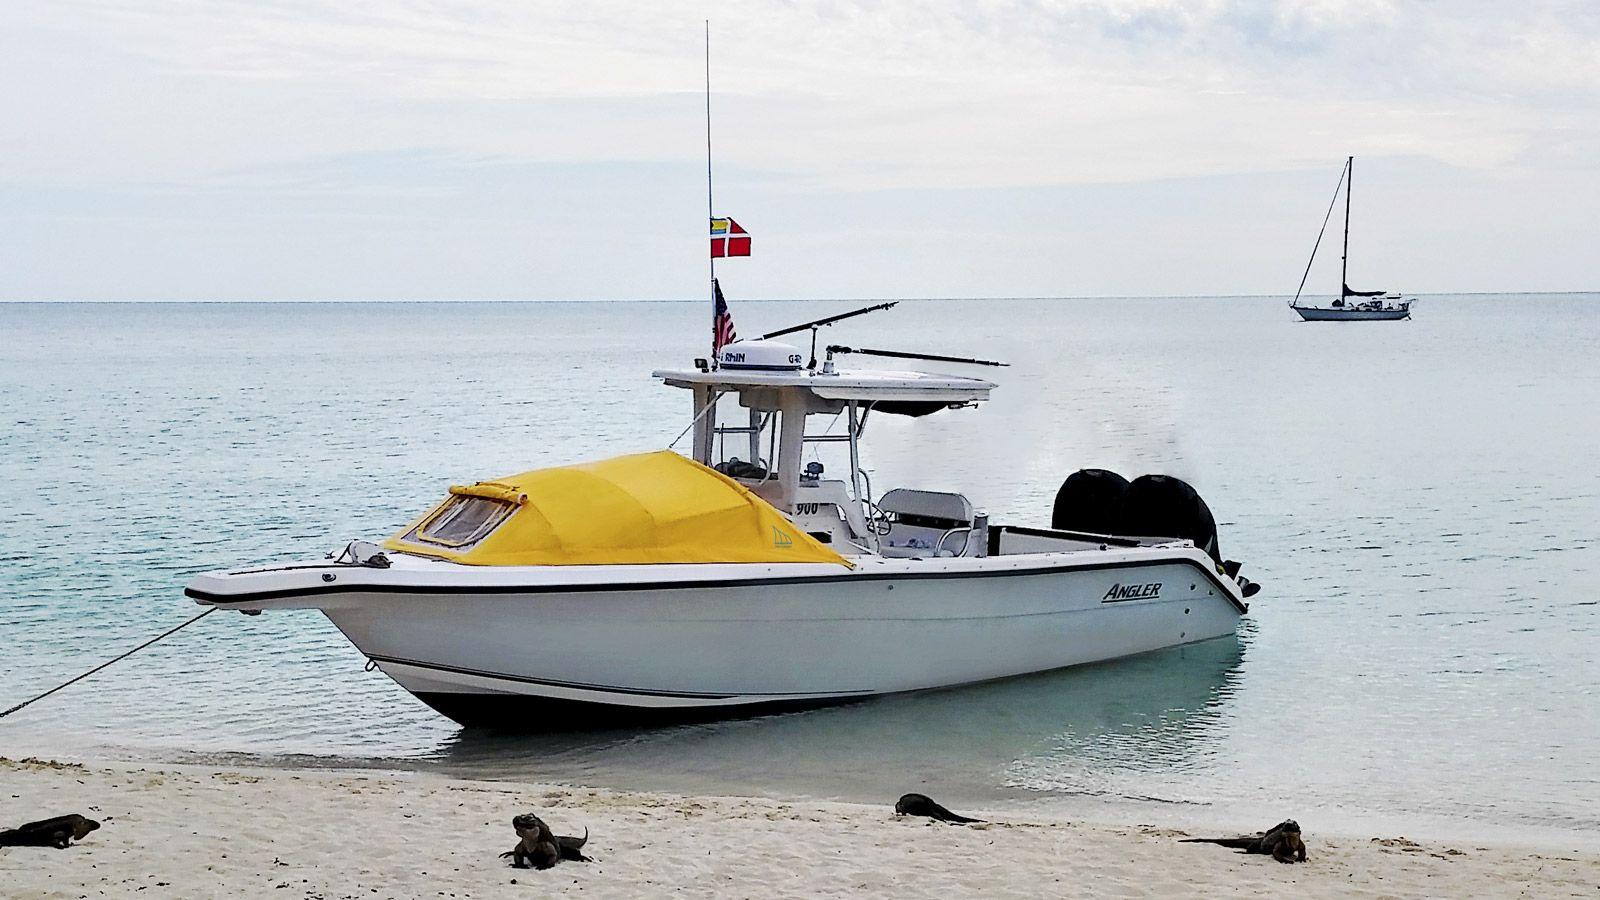 boat covers boat canopy bow dodger boat bimini bimini top boat & boat covers boat canopy bow dodger boat bimini bimini top ...